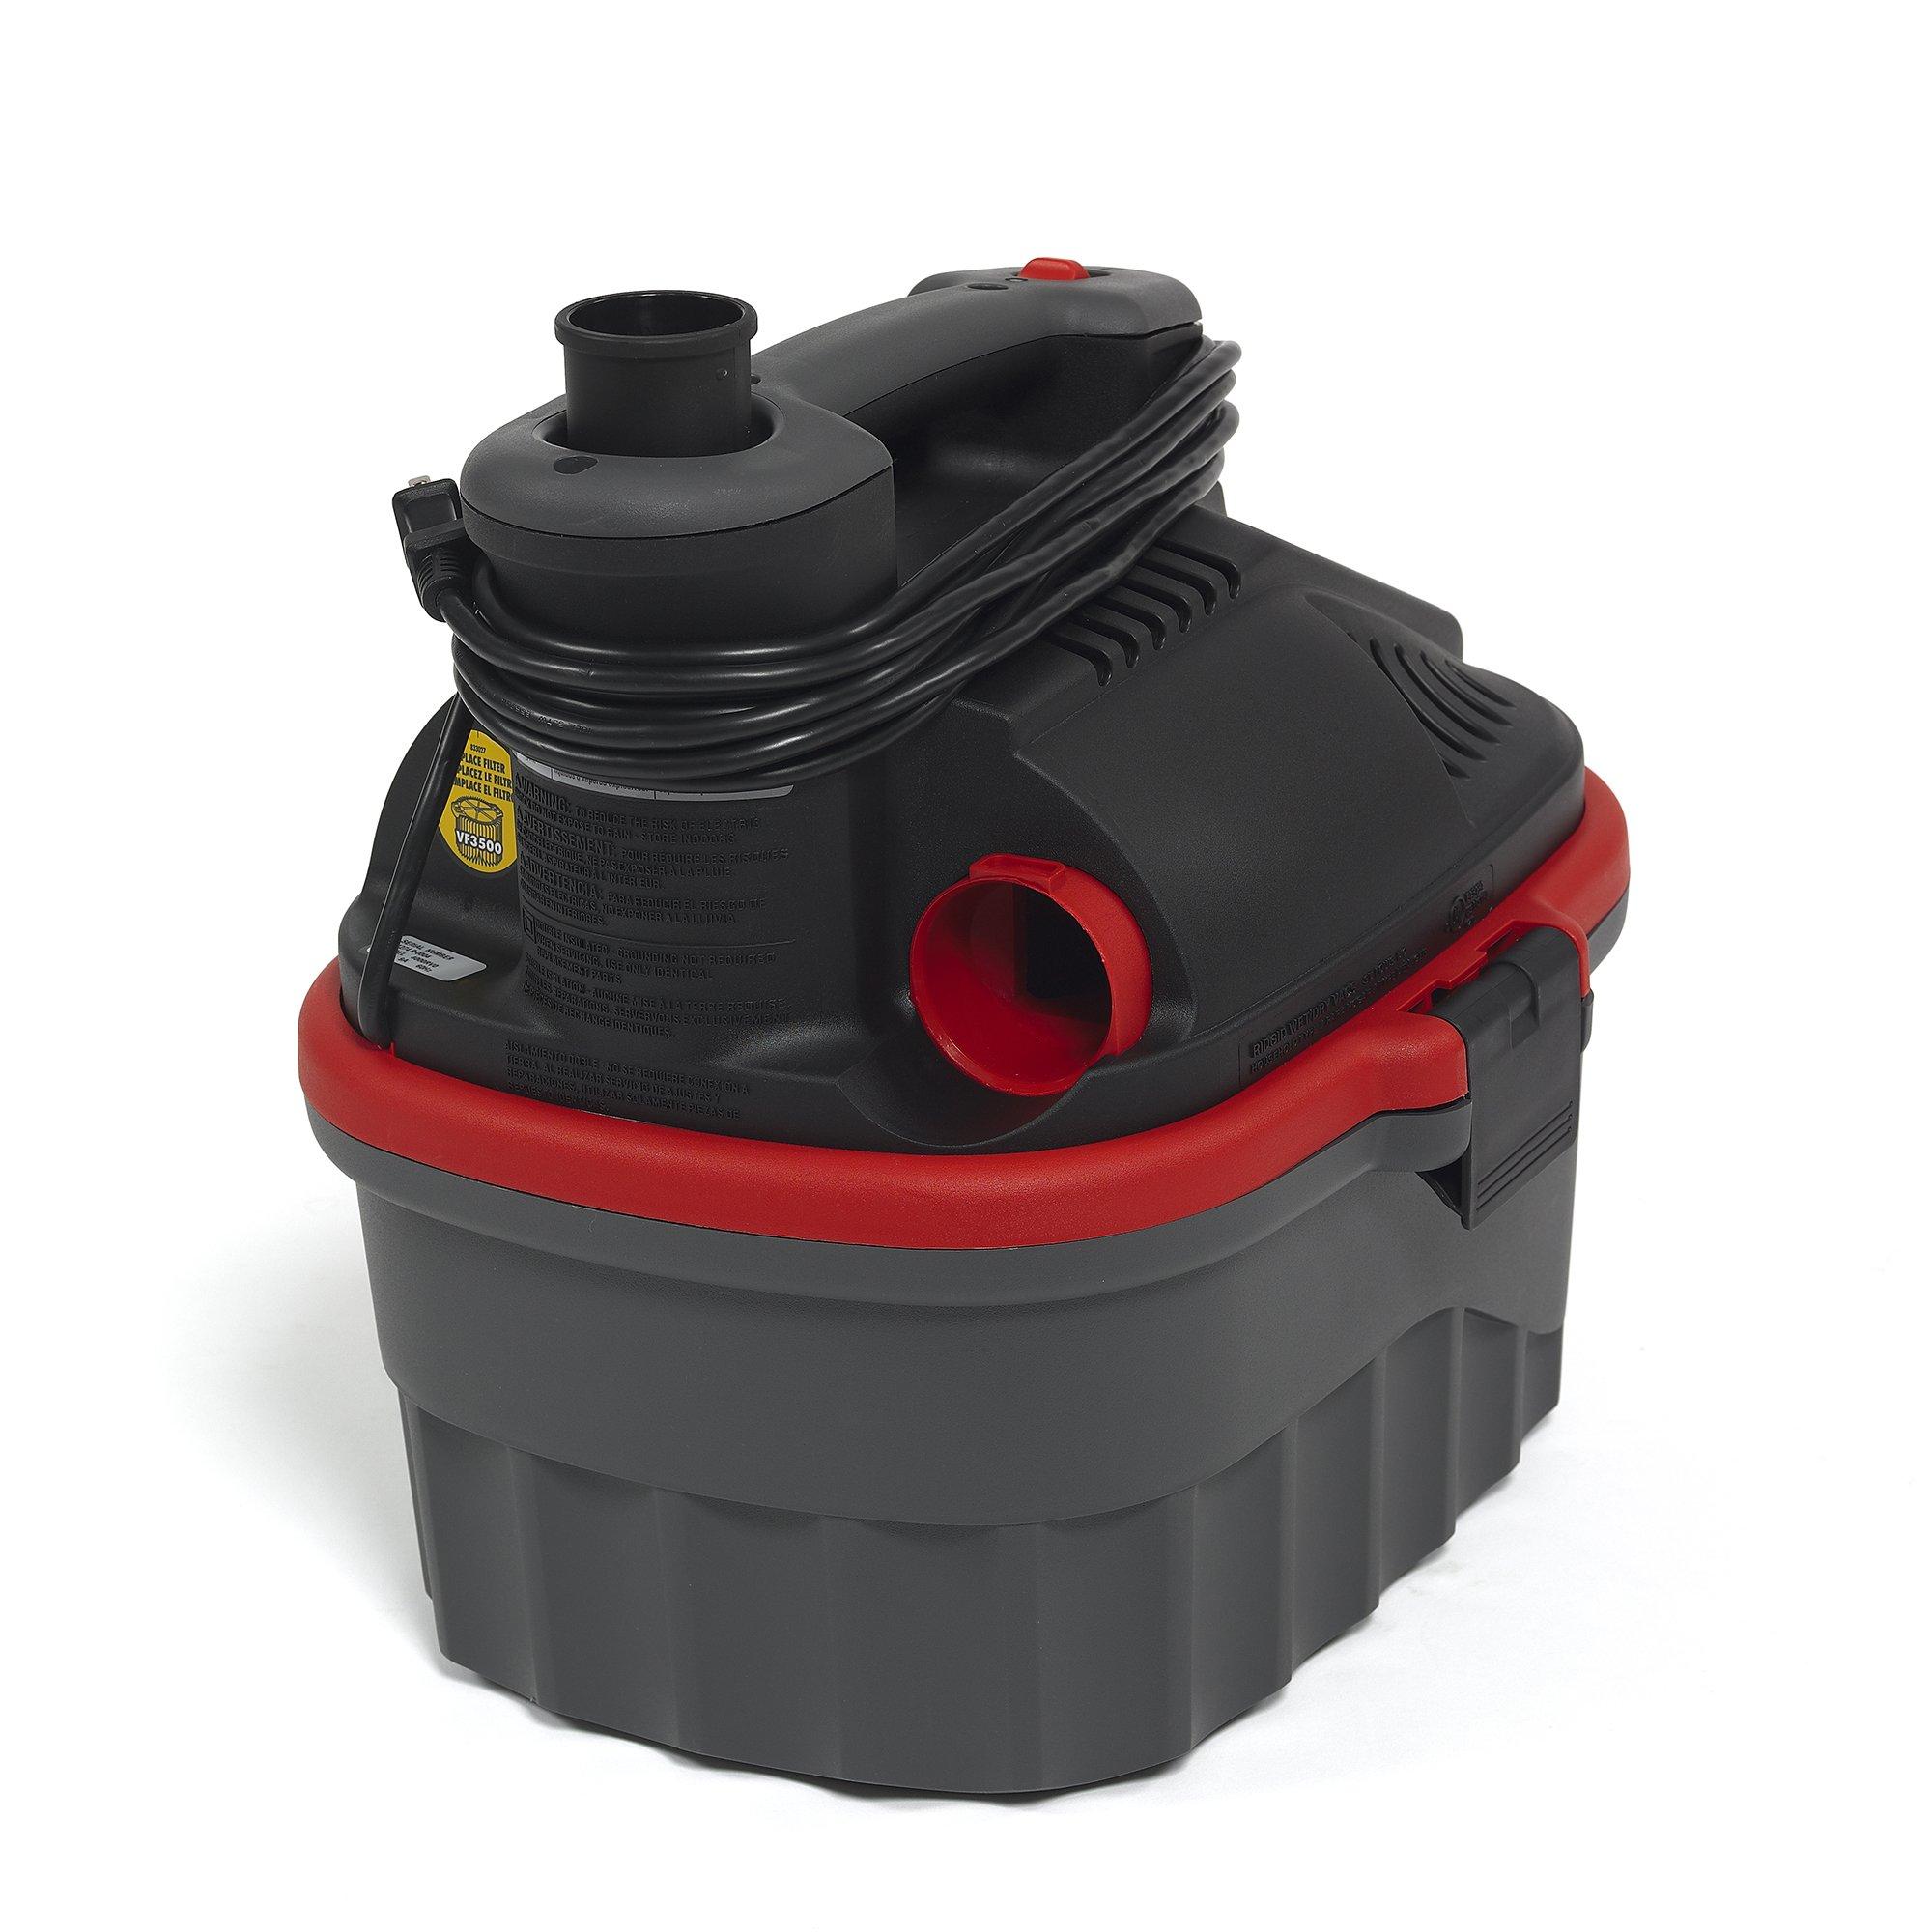 RIDGID 50313 4000RV Portable Wet Dry Vacuum, 4-Gallon Small Wet Dry Vac with 5.0 Peak HP Motor, Pro Hose, Ergonomic Handle, Cord Wrap, Blower Port by Ridgid (Image #2)